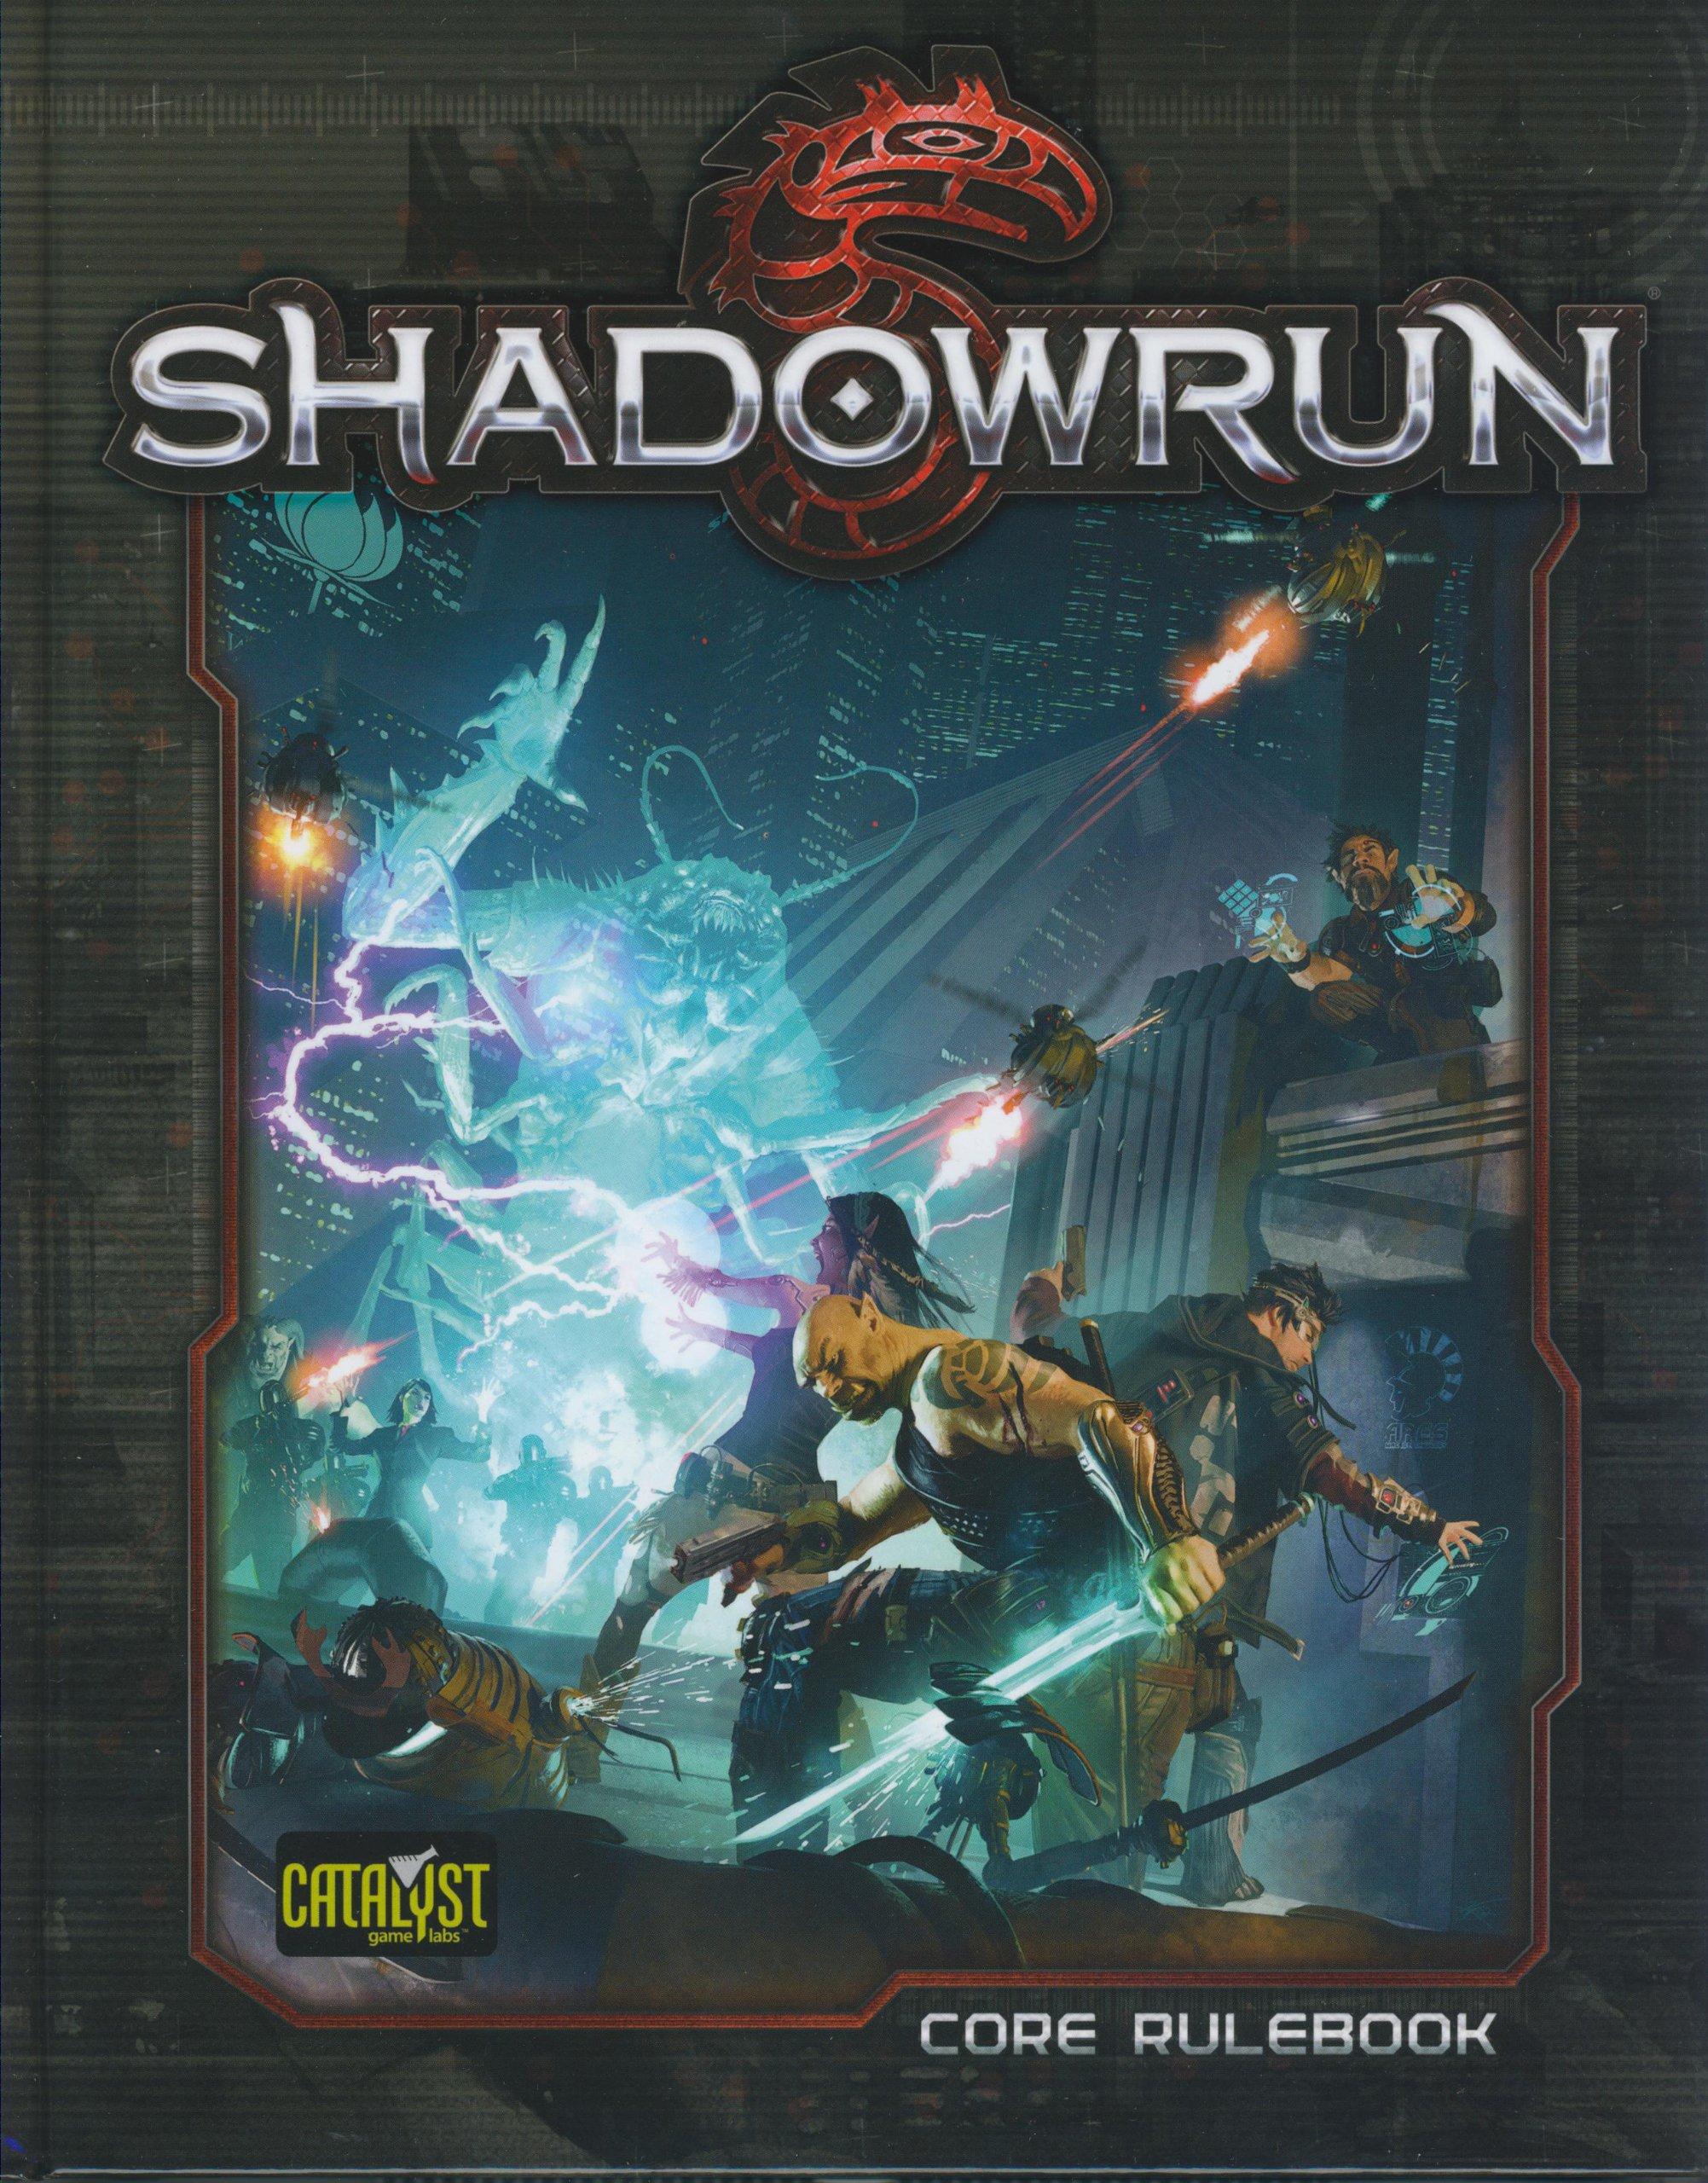 Shadowrun Core Rulebook: Amazon.co.uk: Catalyst Game L: 9781936876518: Books